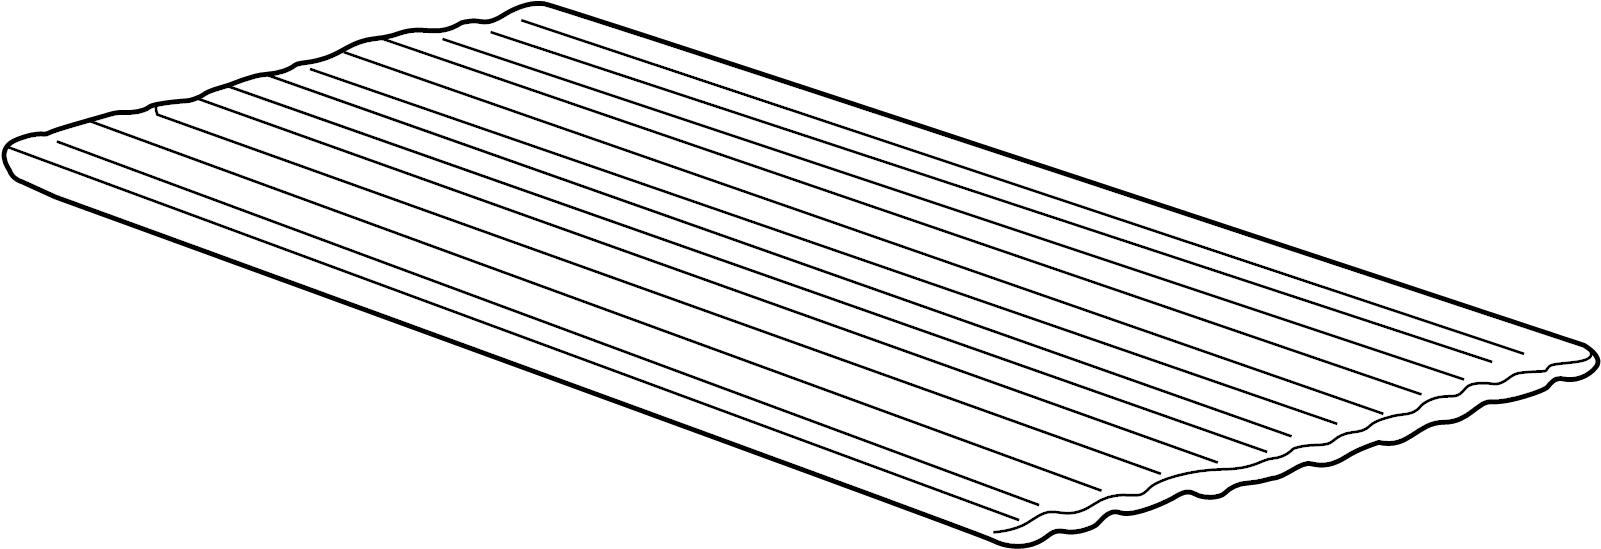 Mazda B2500 Truck Bed Floor  6 Foot Bed  Box  Pick  Rear  Components  Body